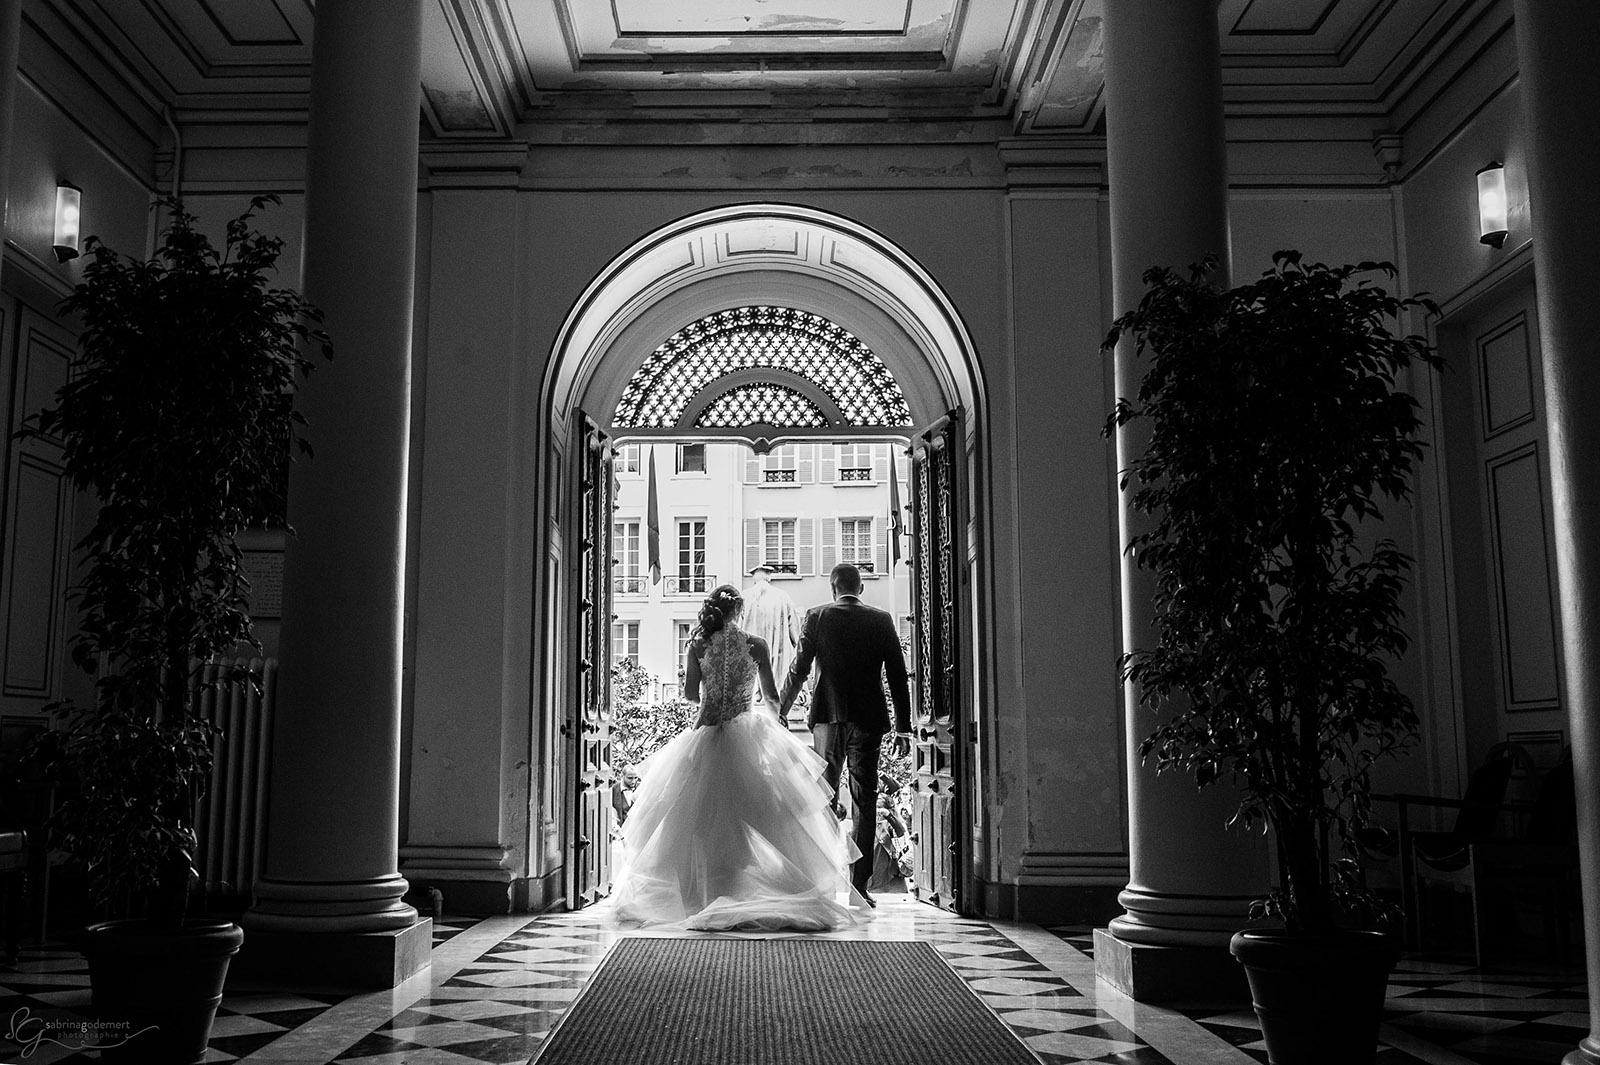 Mariage Soraya et Julien - Sabrina Godemert photographe-144